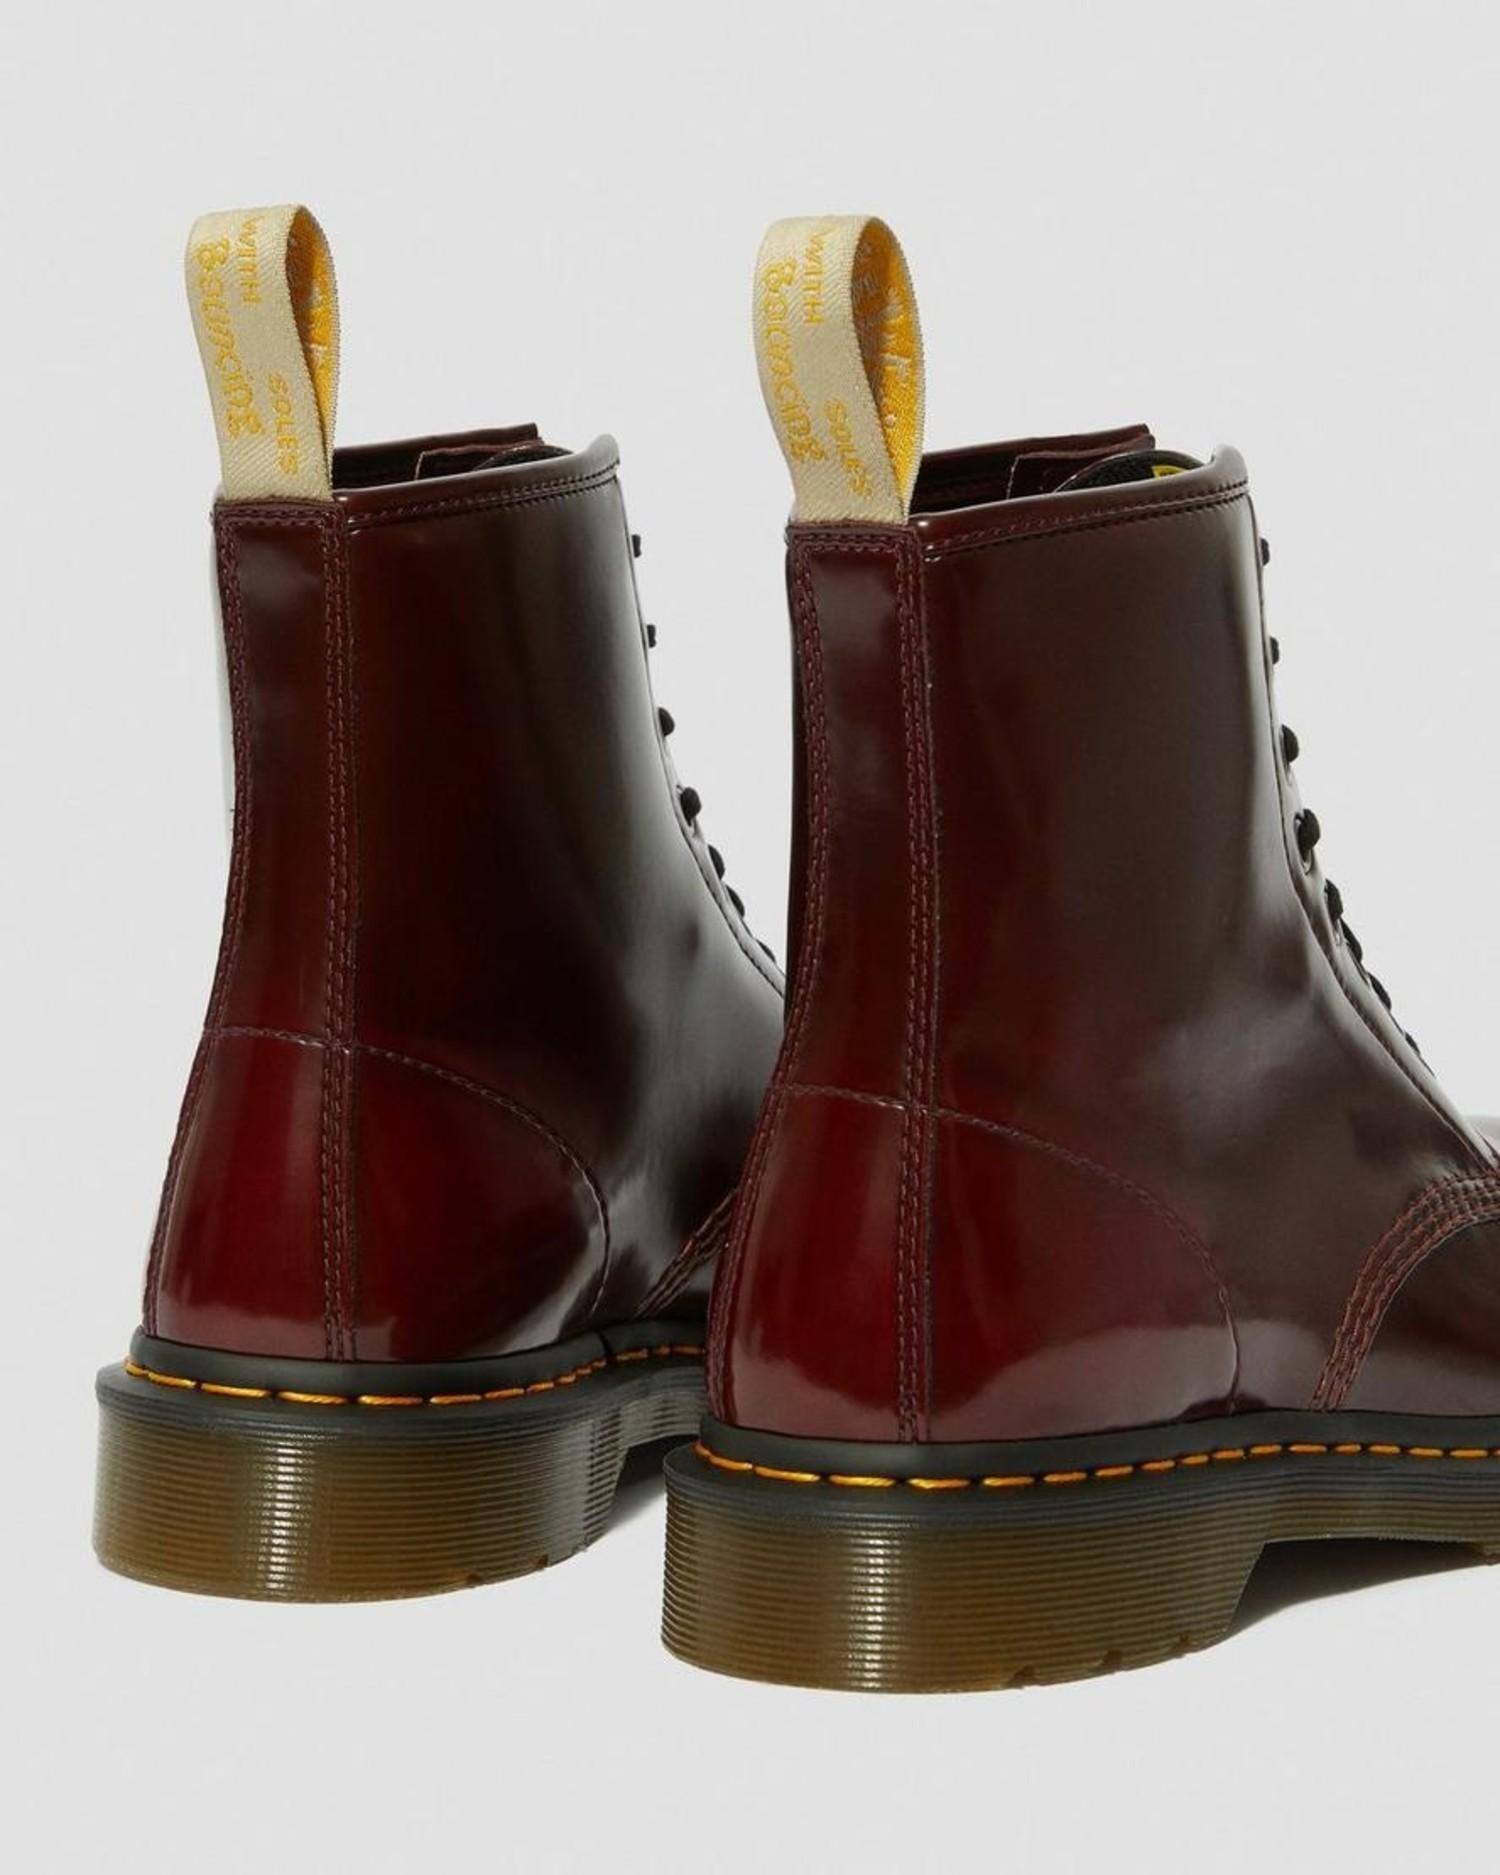 Vegan 1460 (8 Eye) Boot in Cherry Red